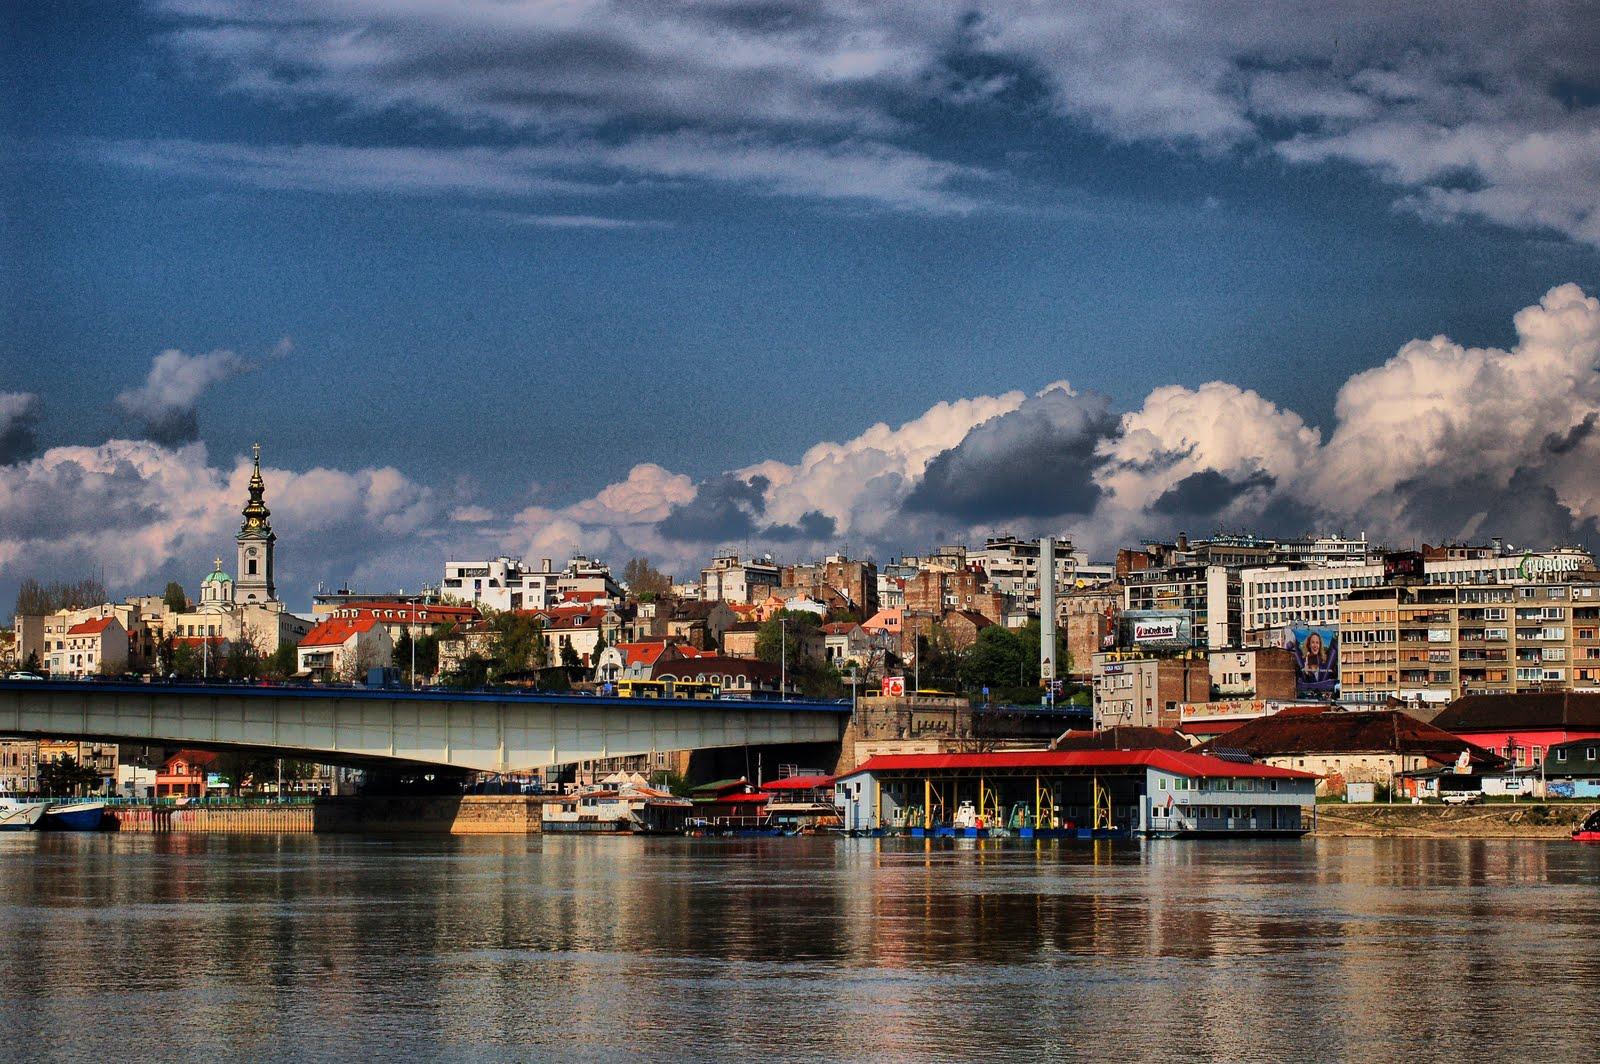 serbia - photo #13